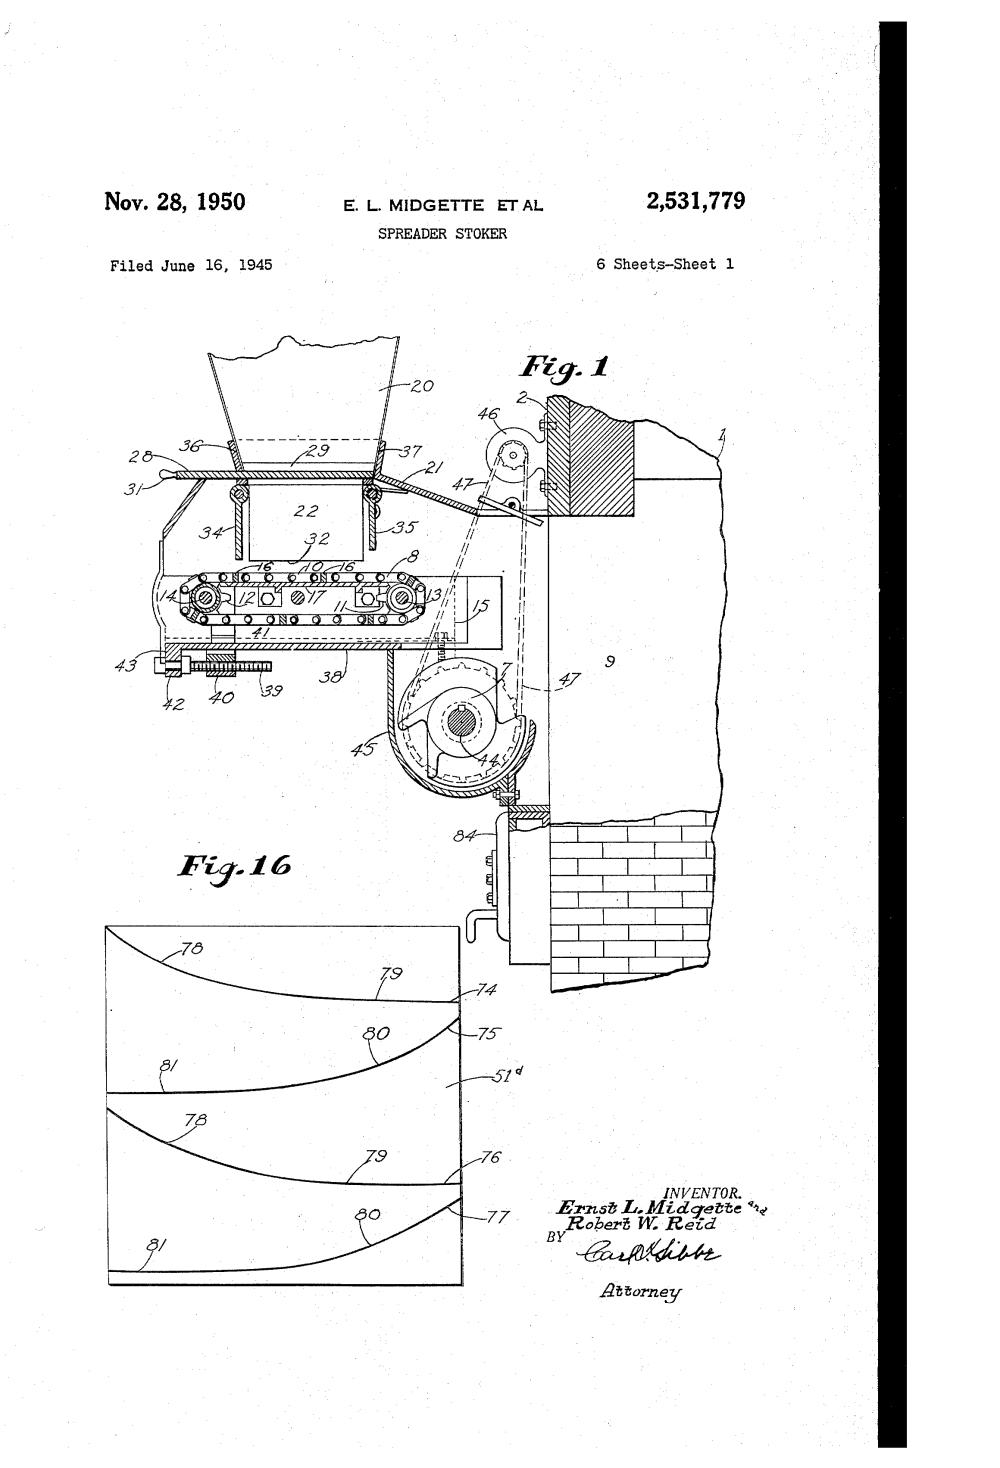 medium resolution of  patent us2531779 spreader stoker google patents on